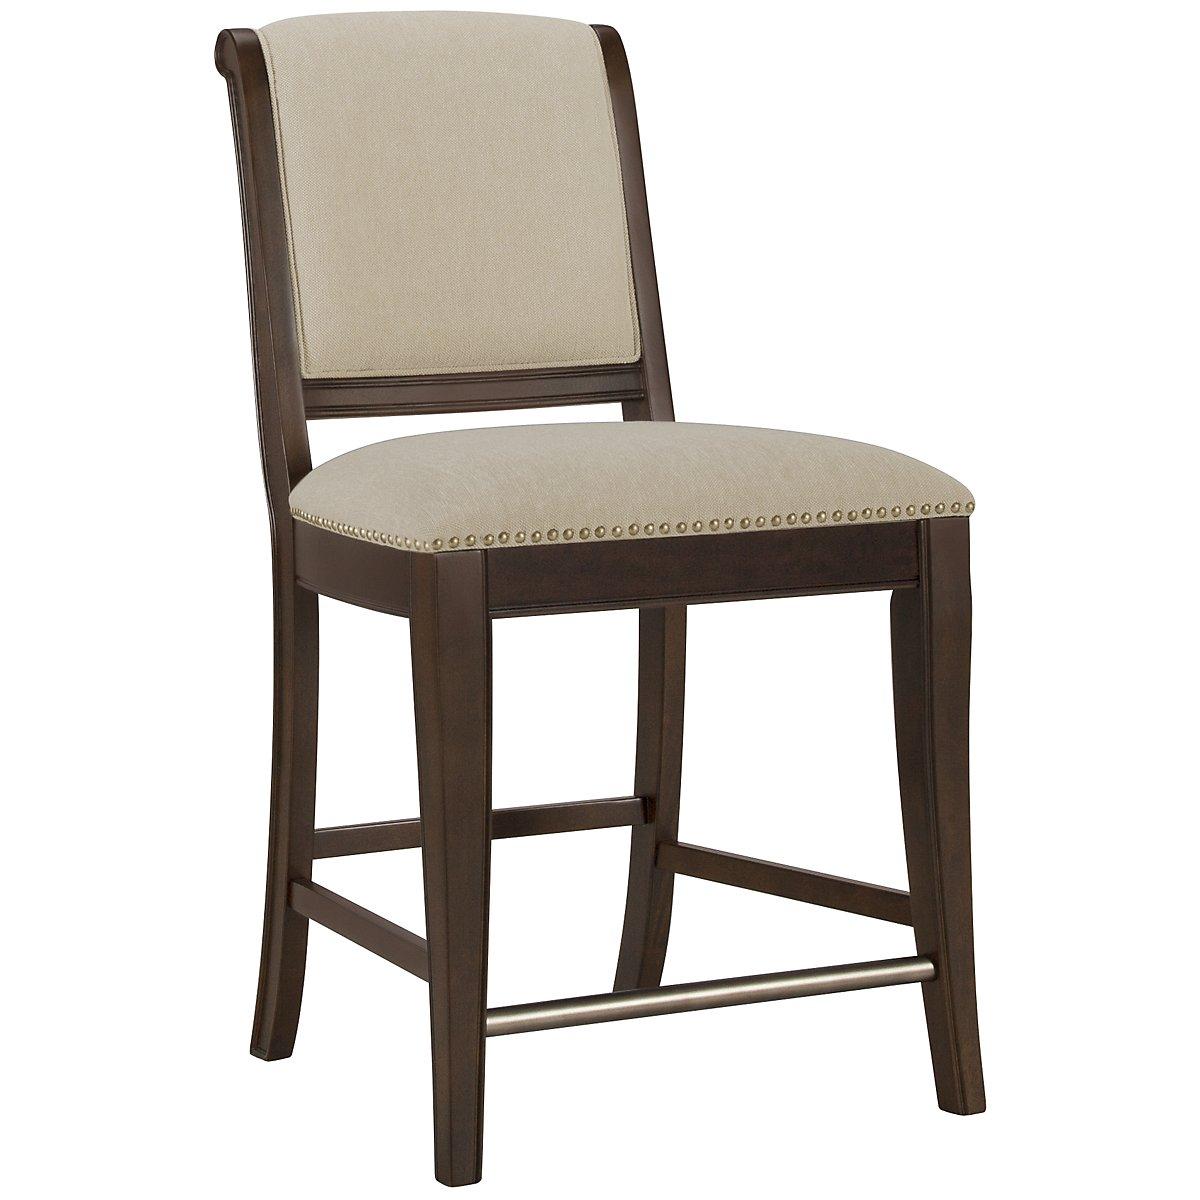 "Canyon Dark Tone 24"" Upholstered Barstool"